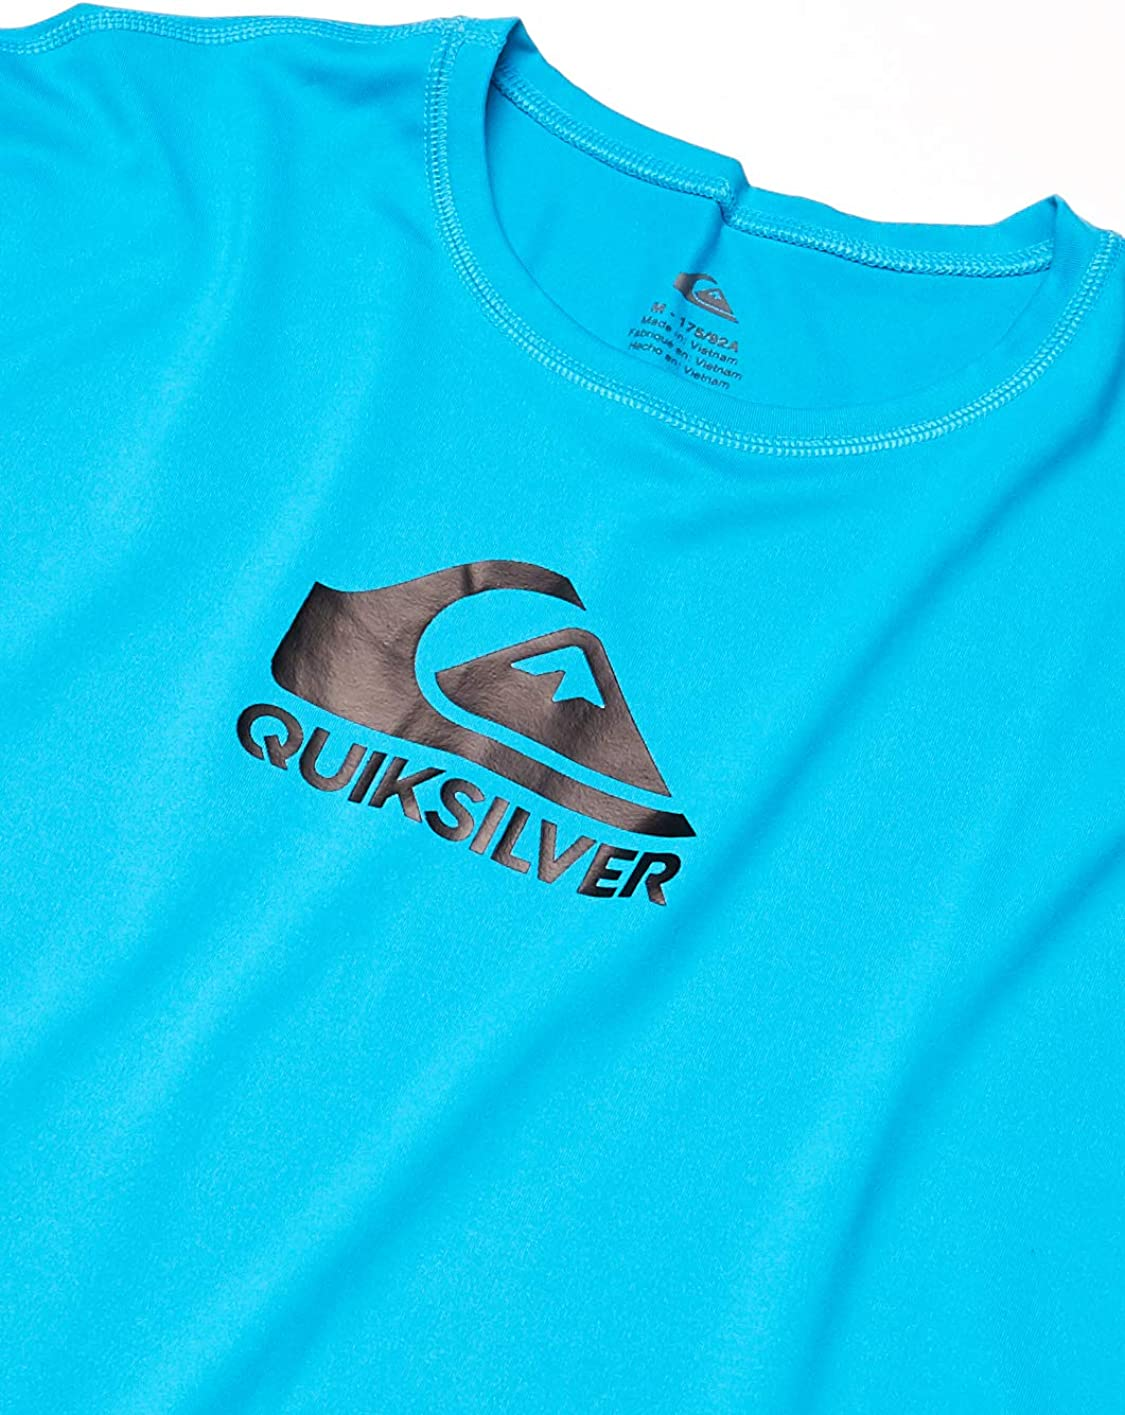 Quiksilver Mens Solid Streak Long Sleeve Rash Guard